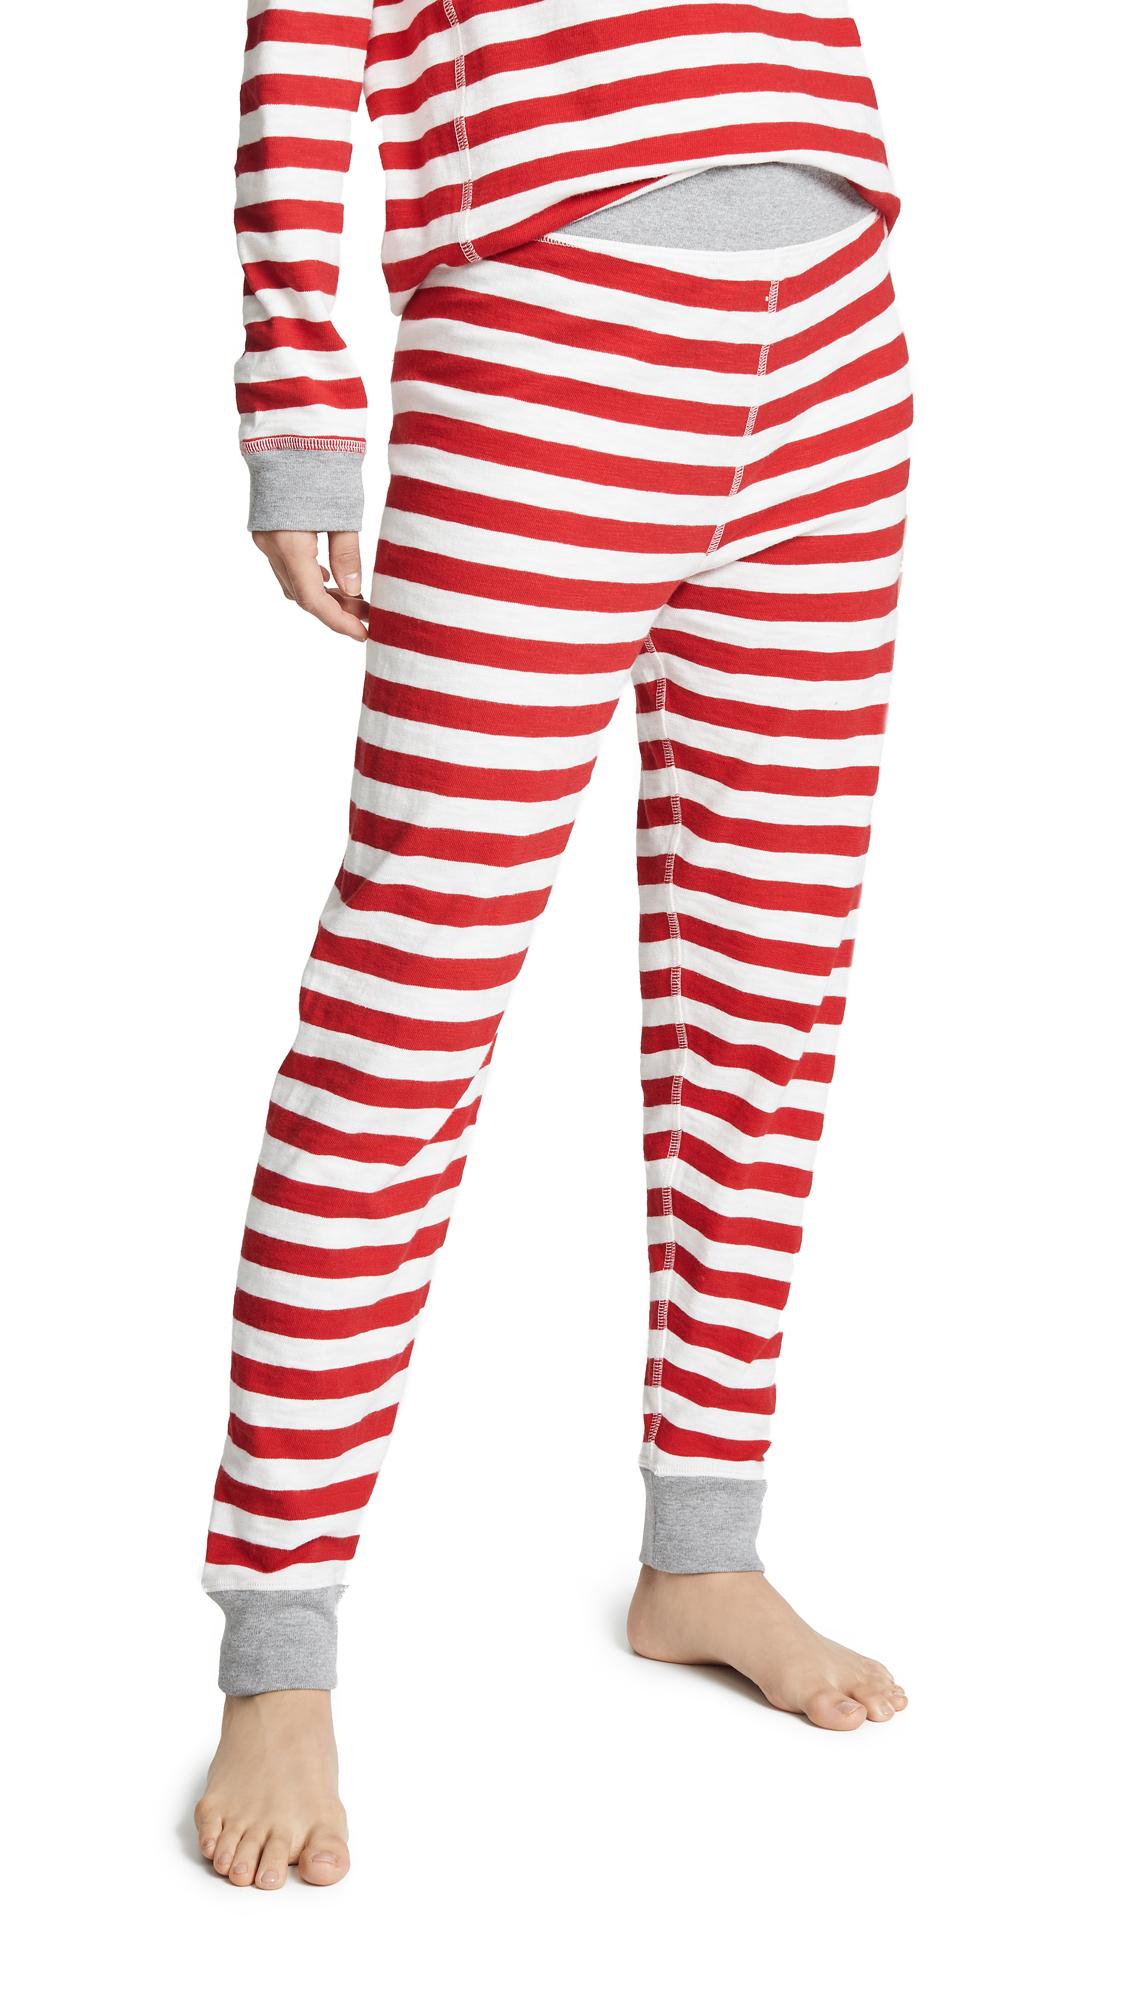 SLEEPY JONES Helen Cotton Stripe Leggings in Medium Stripe Red